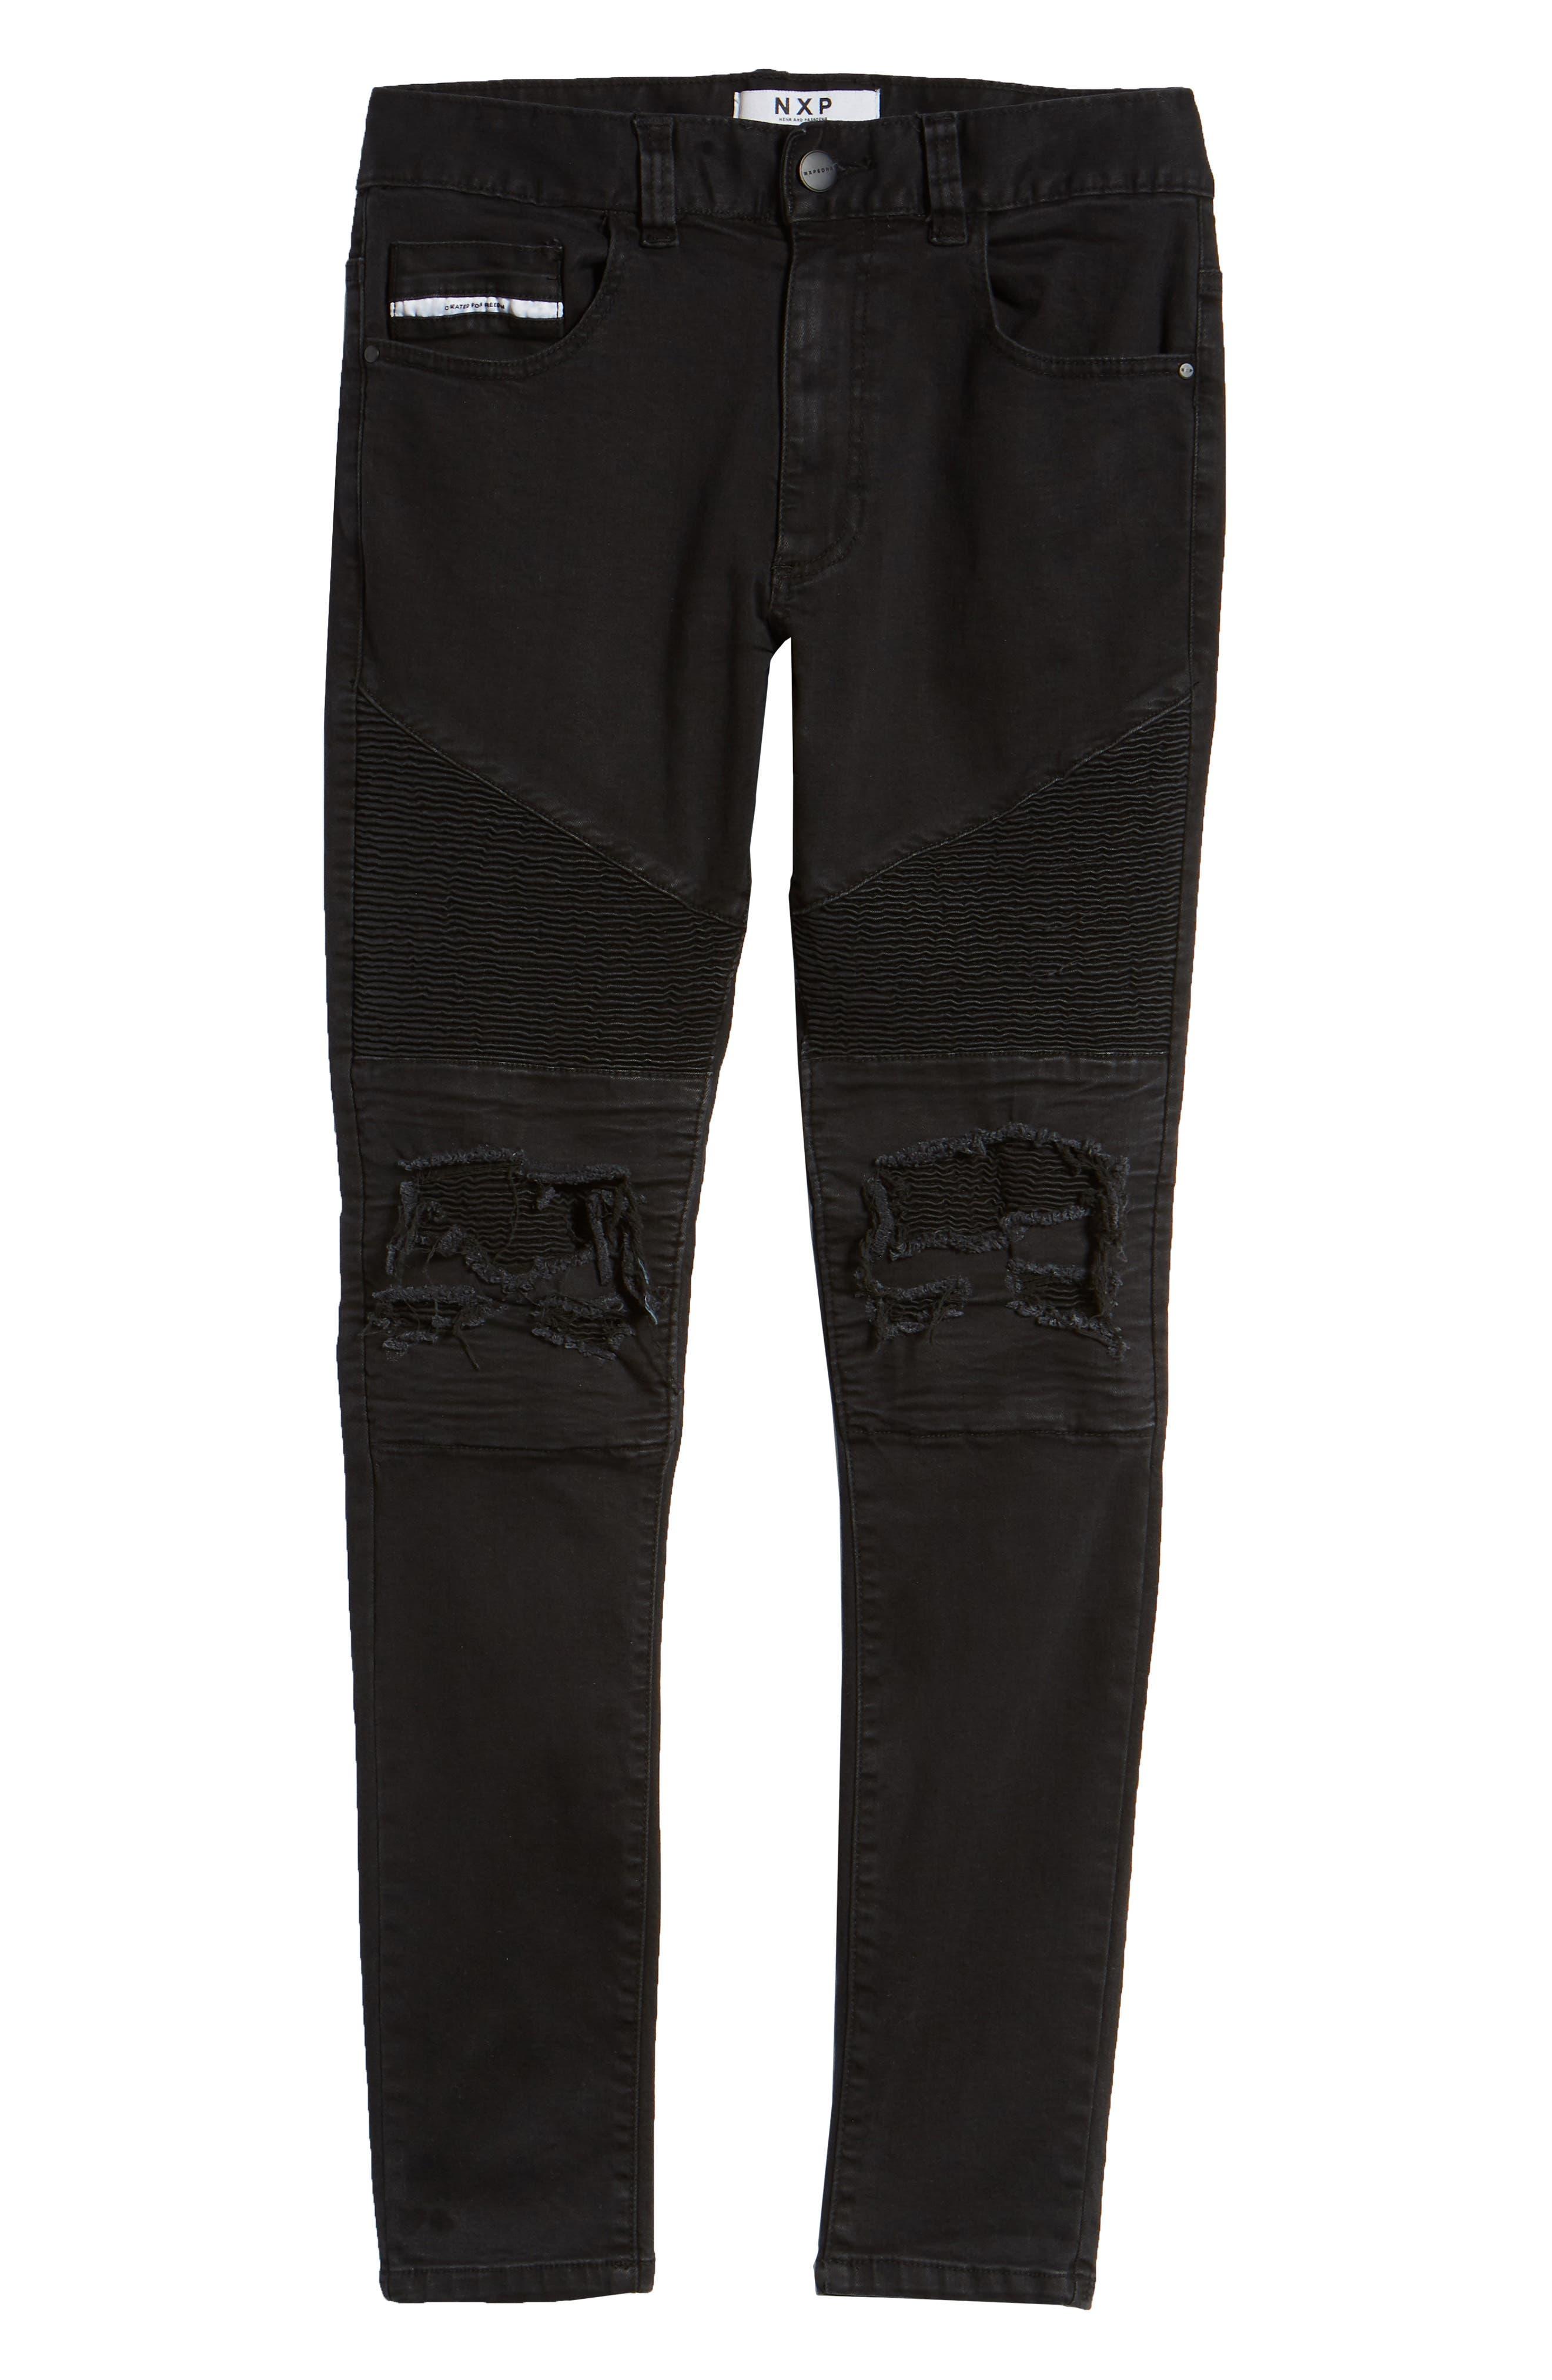 Combination Moto Skinny Moto Jeans,                             Alternate thumbnail 6, color,                             BLACK